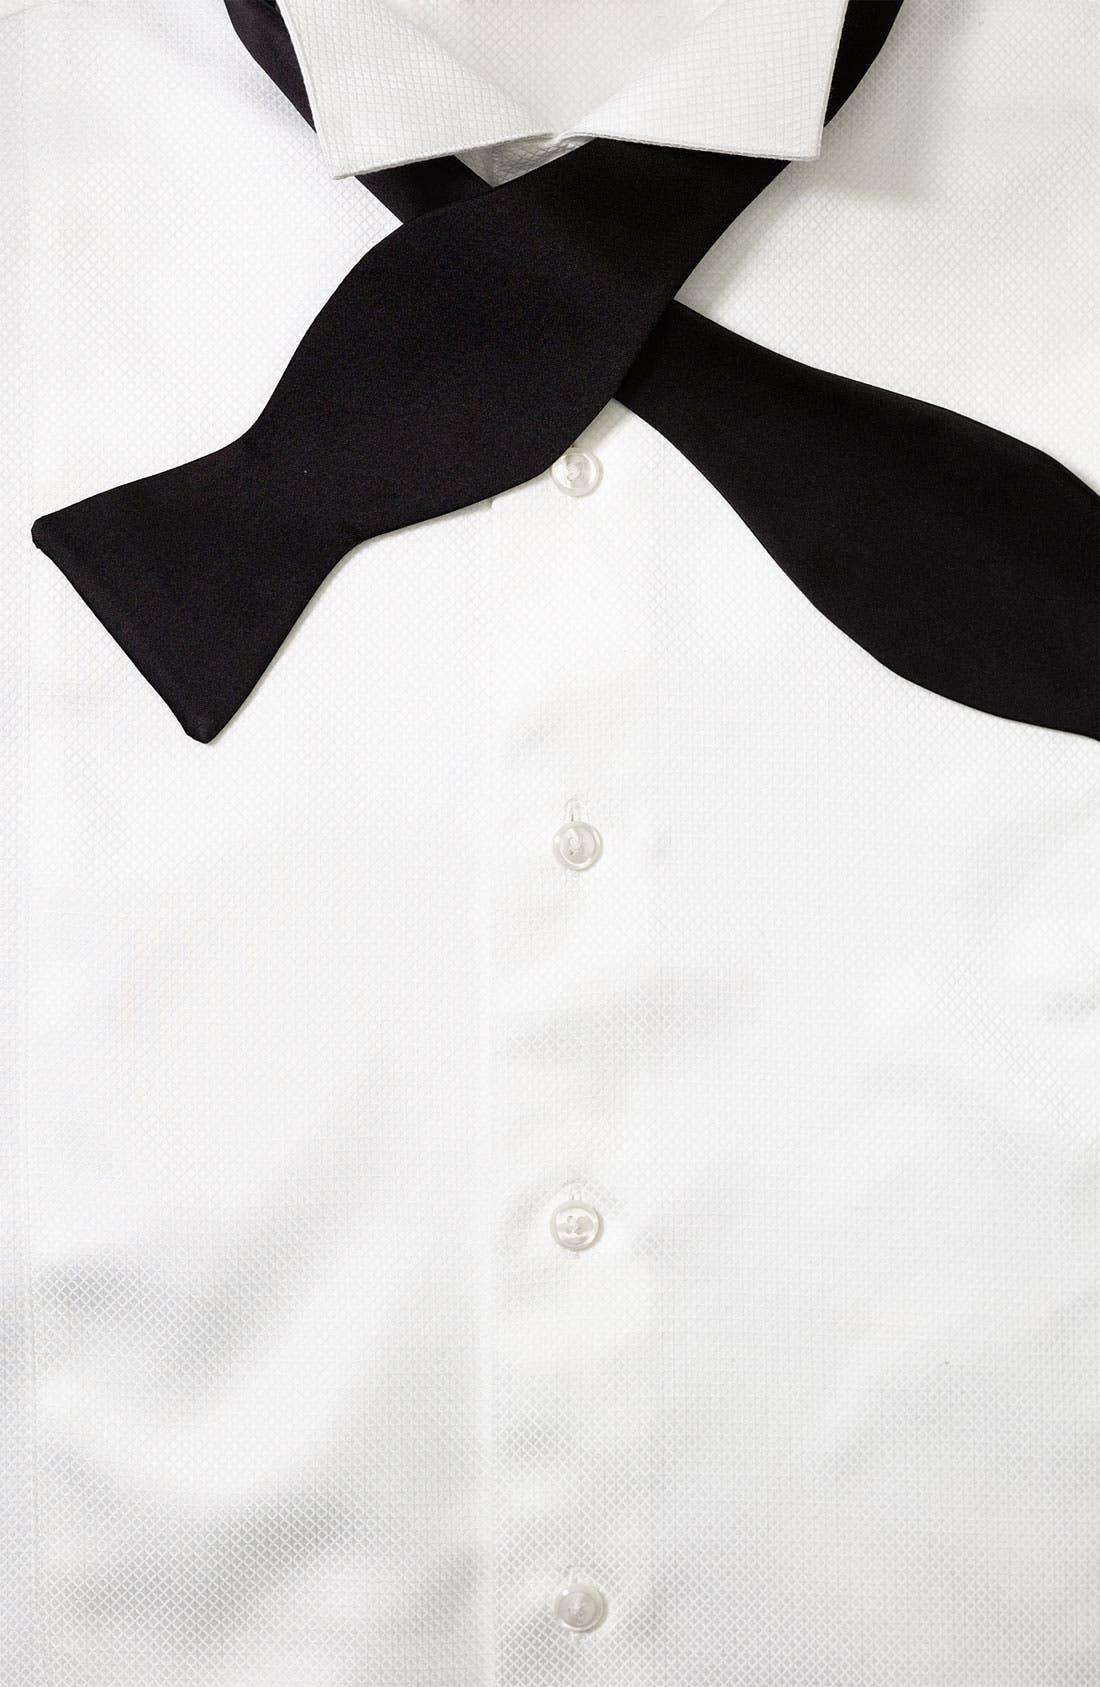 Alternate Image 1 Selected - David Donahue Bow Self-Tied Tie